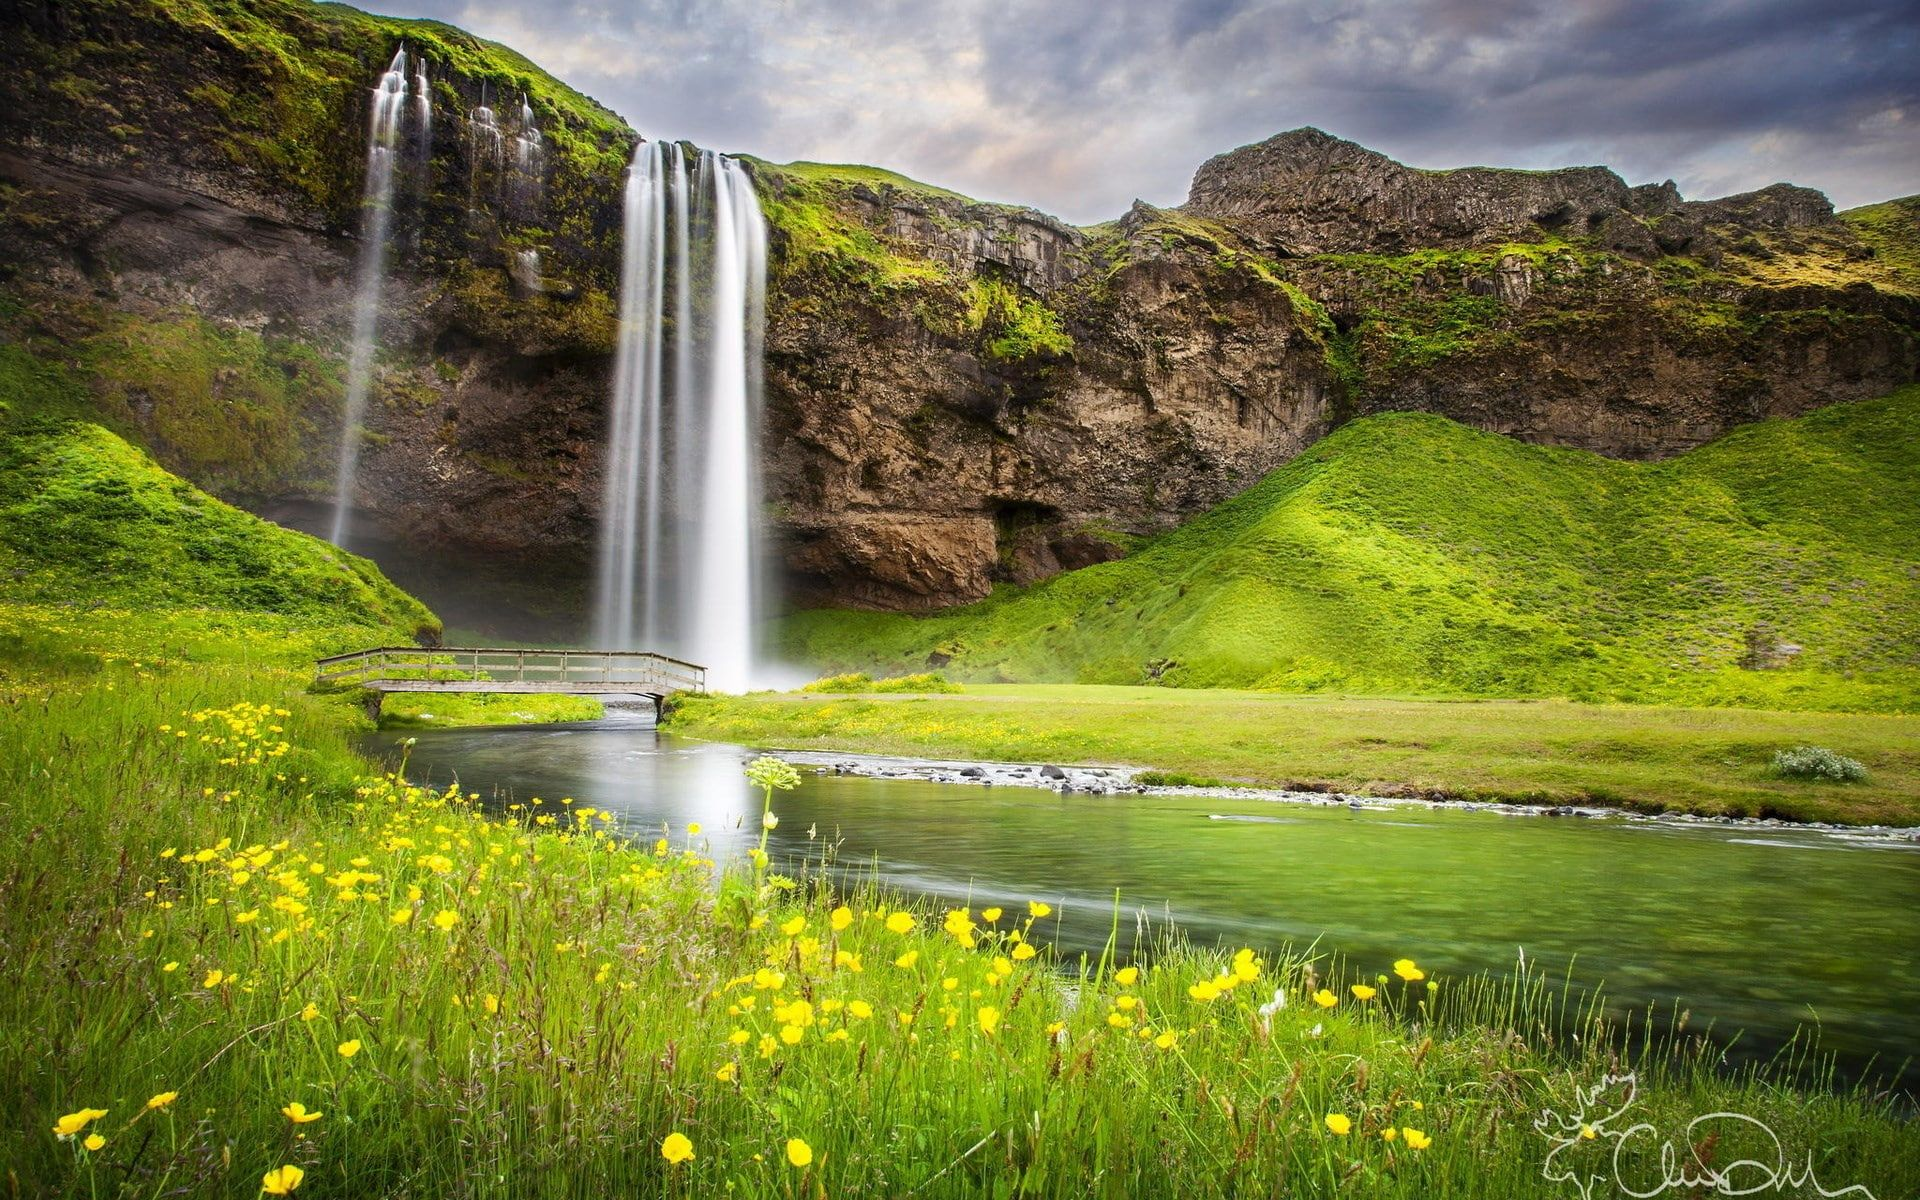 Hd High Resolution Nature 1920x1200 1080p Wallpaper Hdwallpaper Desktop In 2020 Waterfall Landscape Pictures Iceland Waterfalls